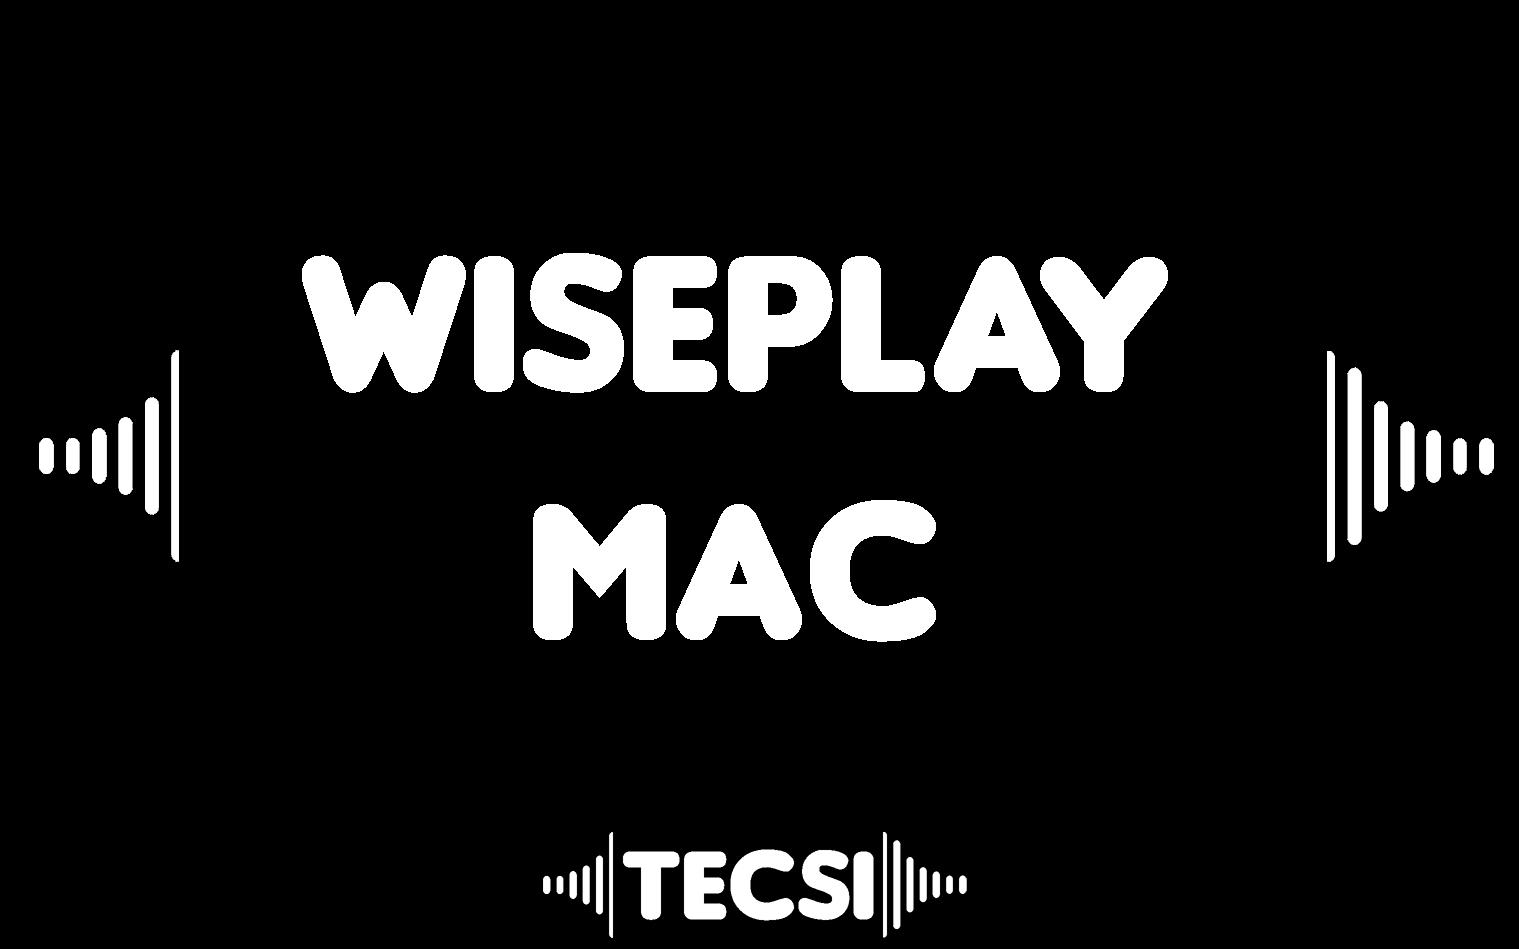 wiseplay mac